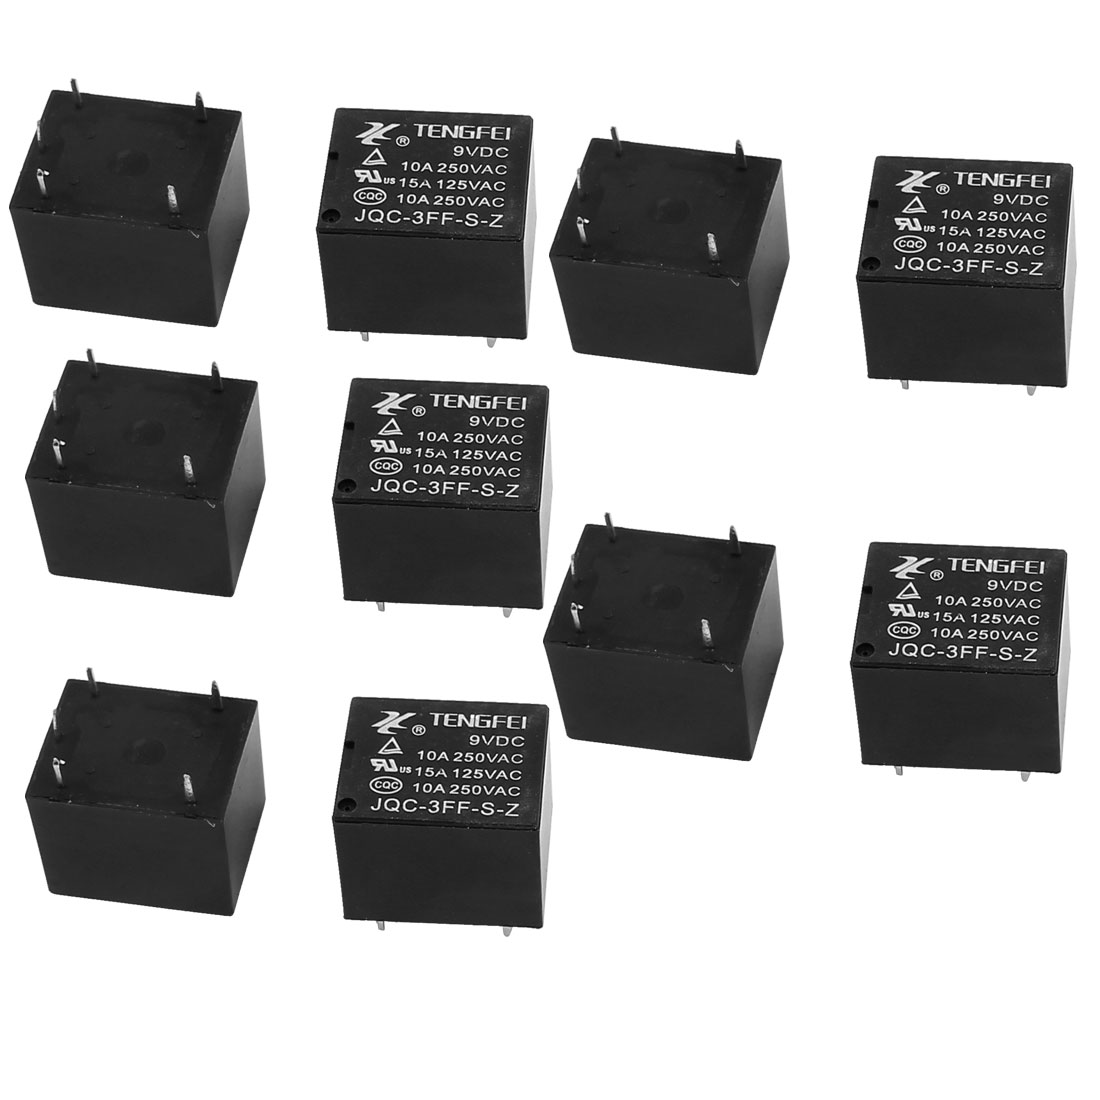 10Pcs JQC-3FF-S-Z DC9V 10A 0.36W 4 Terminal SPST NO Mini Changeover Power Relay